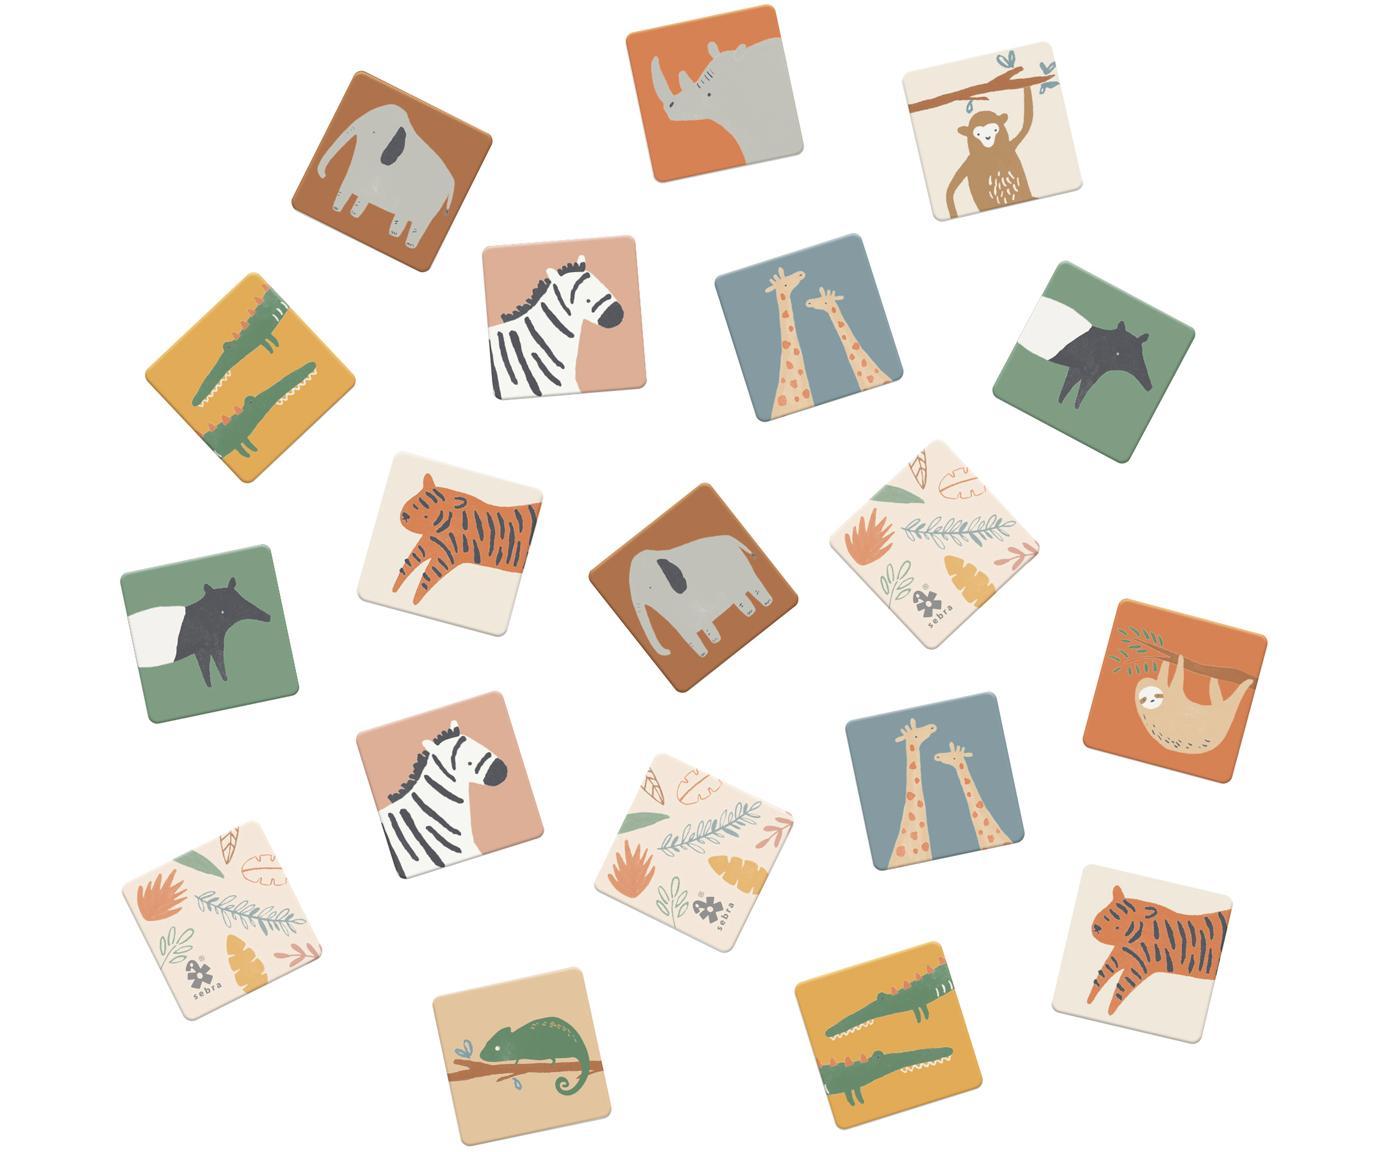 Memoryspel Wildlife, 30-delig, Massief karton, Multicolour, 6 x 6 cm